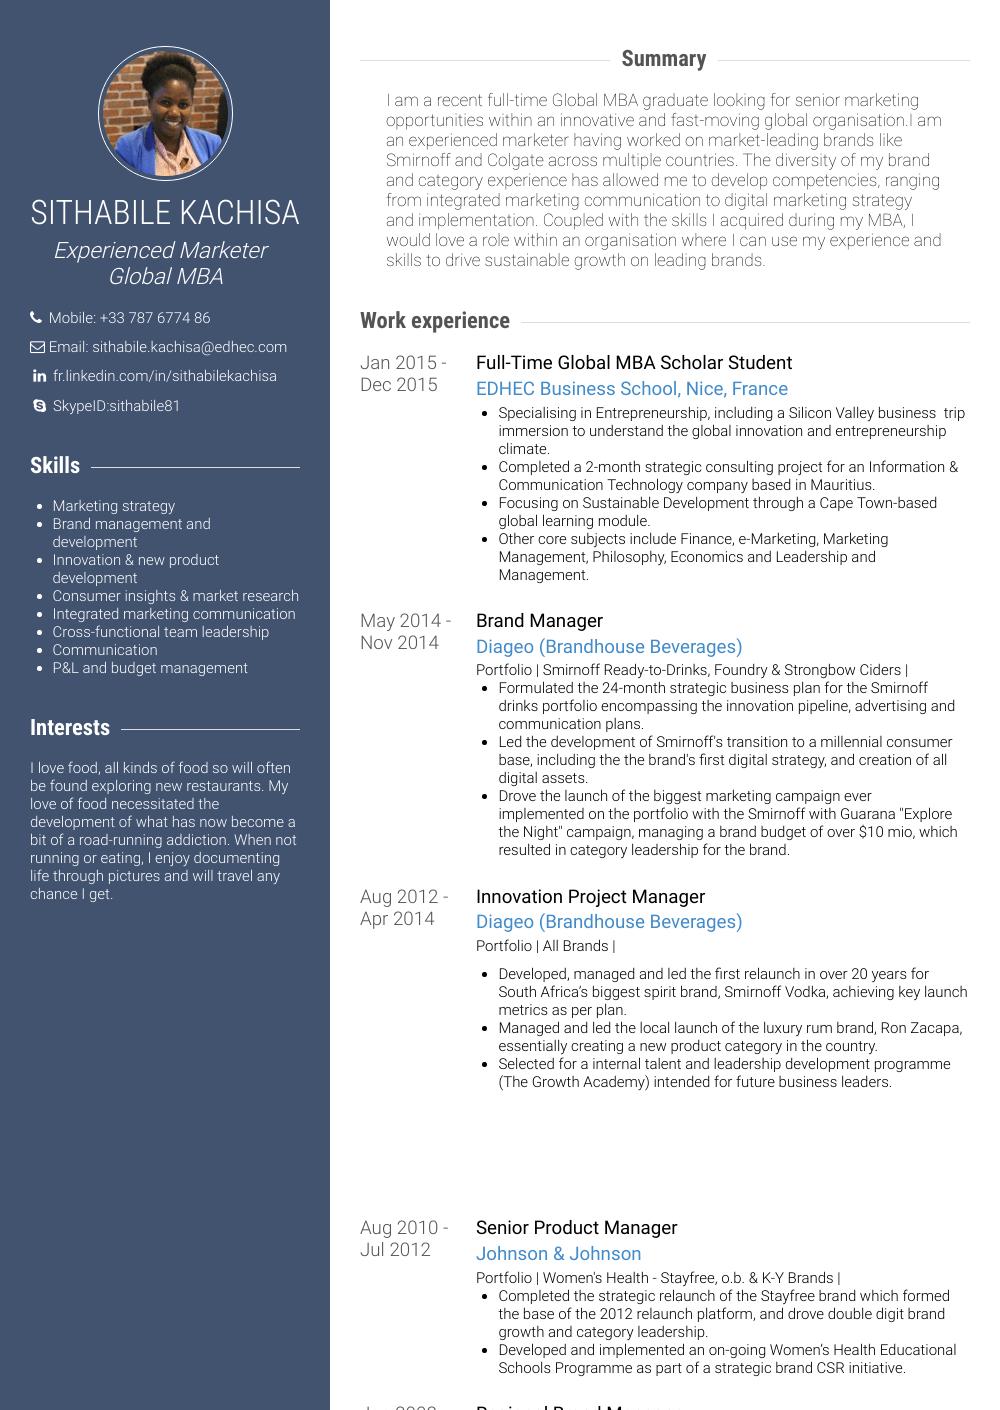 Mba  Resume Samples  Templates  VisualCV